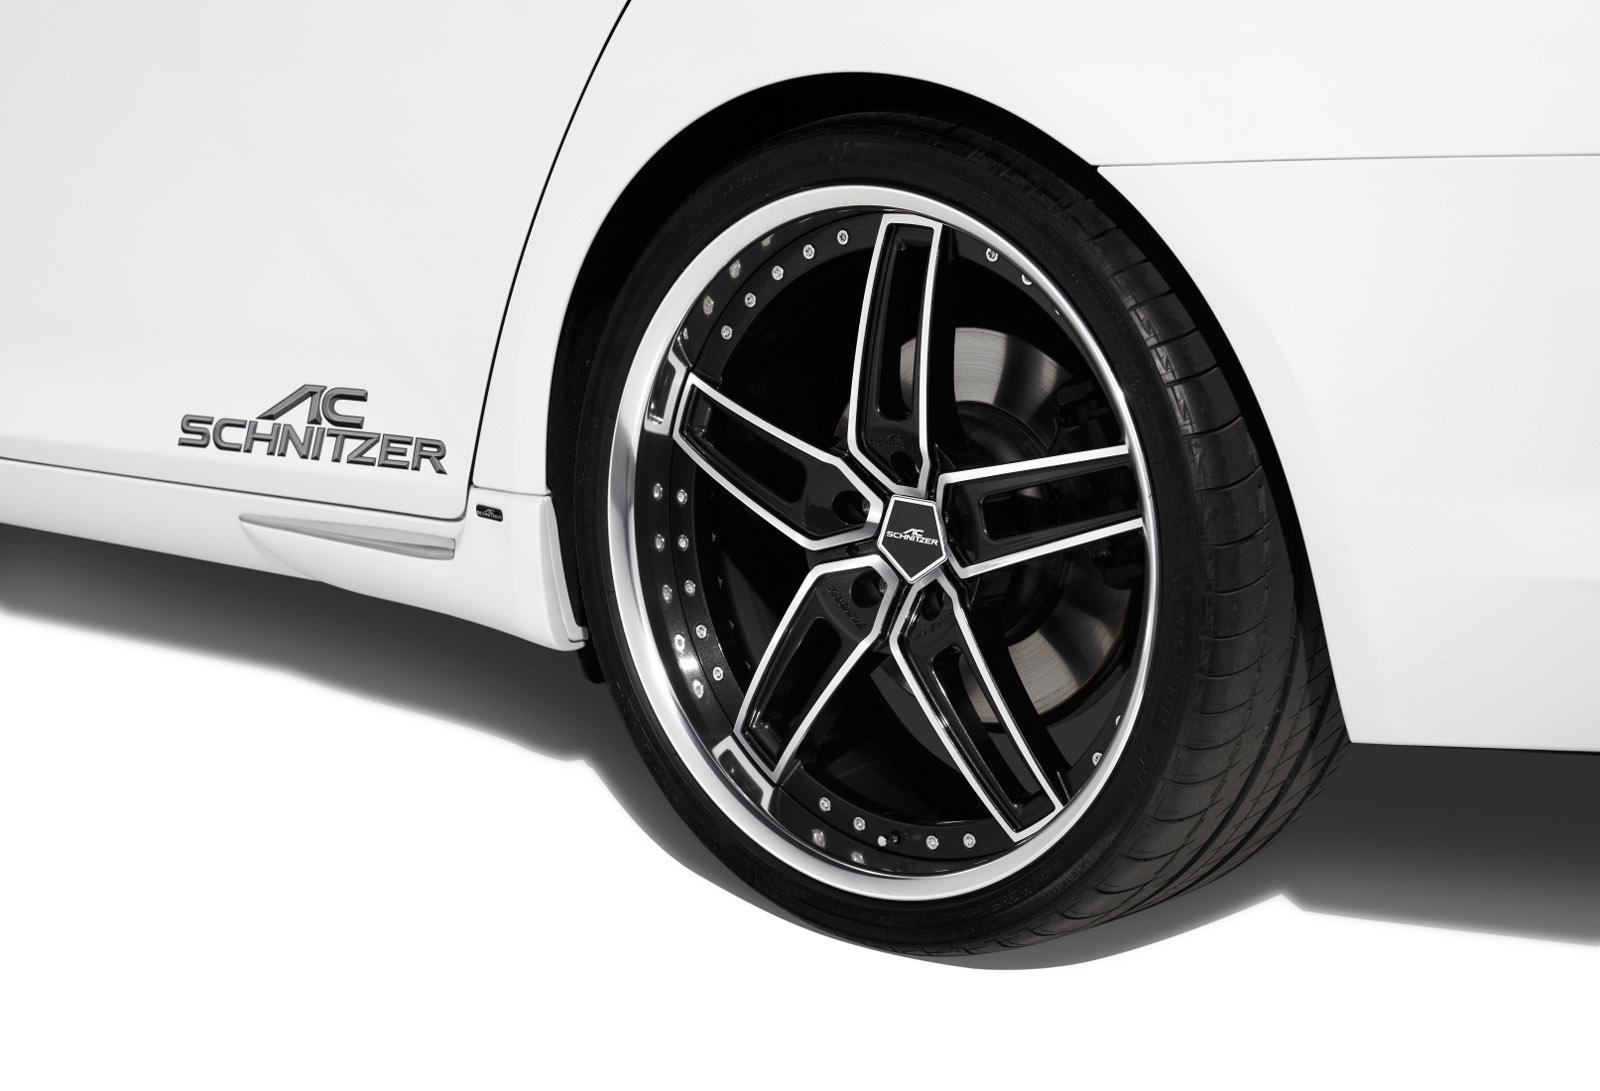 AC Schnitzer Type VIII кованые Racing Wheel - фотография №2